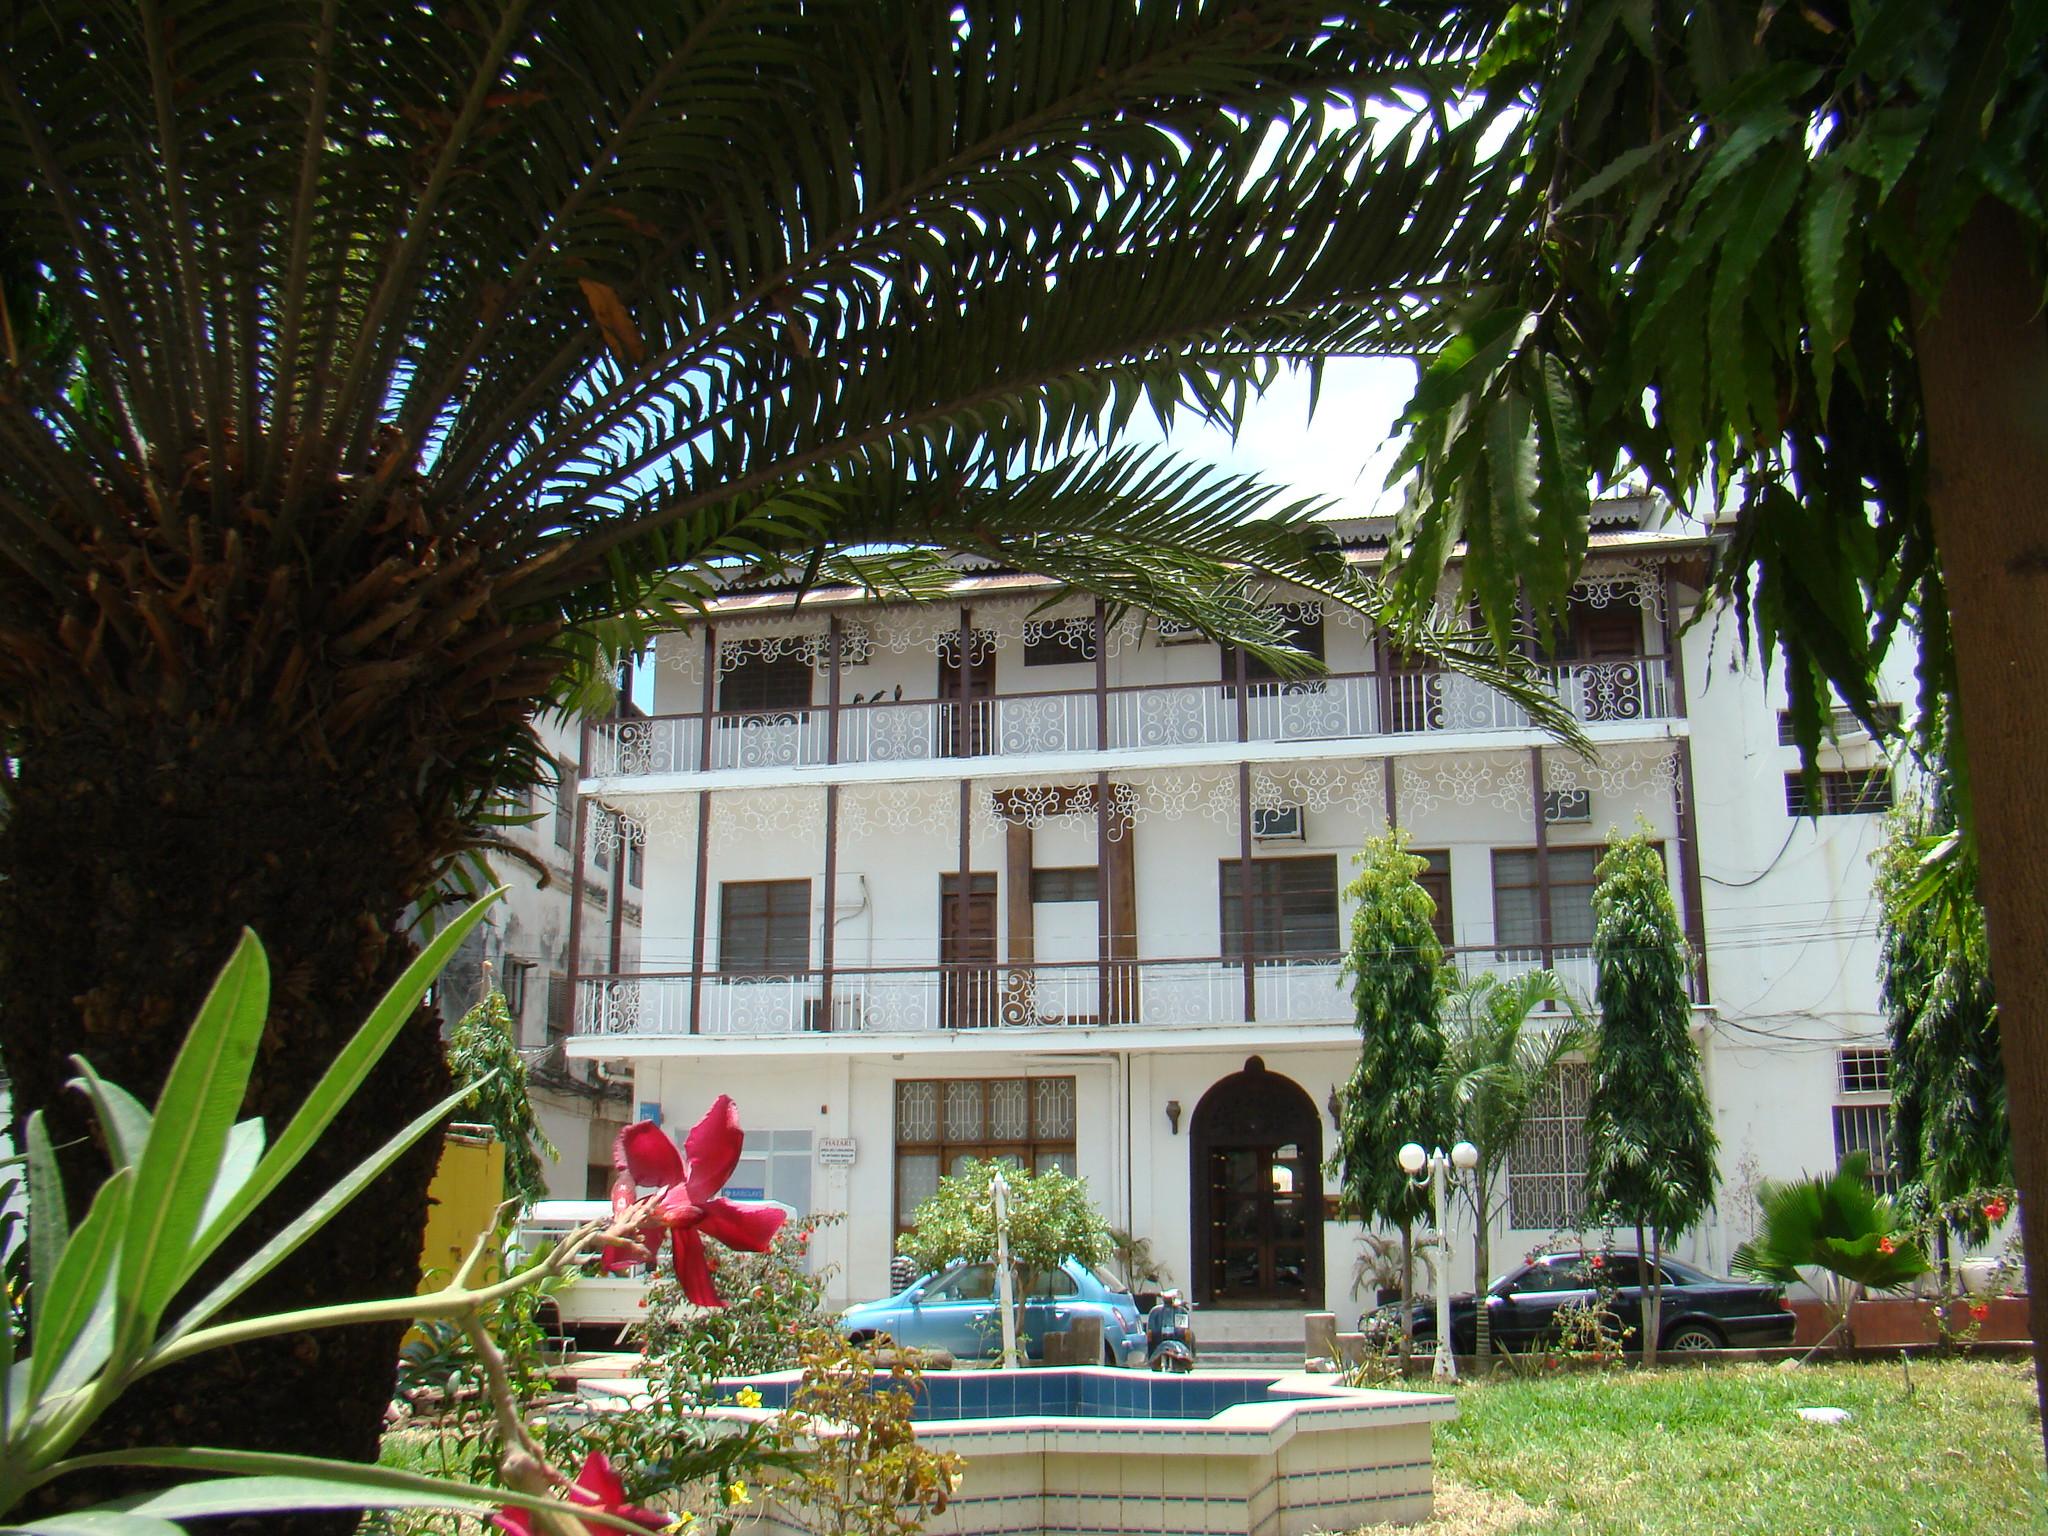 edificio antigua casa con balcones de Stone Town Zanzíbar Tanzania Patrimonio de la Humanidad Unesco